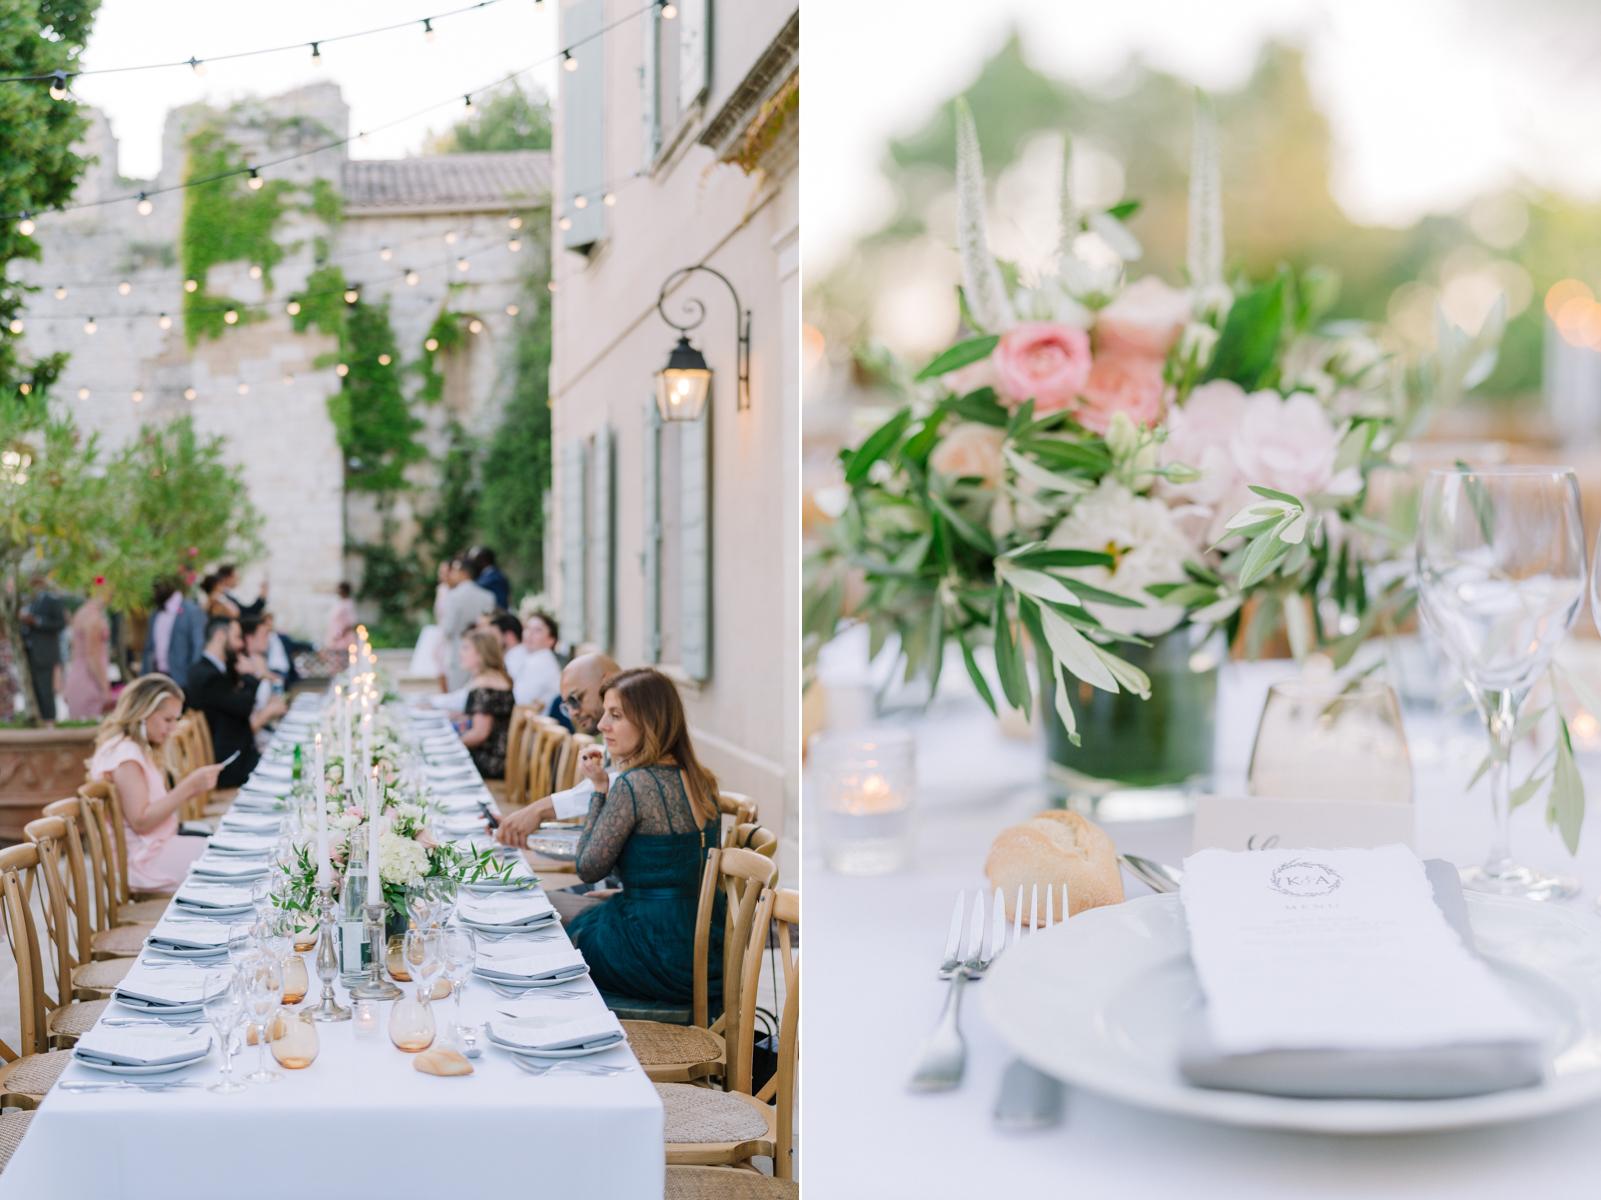 Boheme-Moon-Photography-Wedding-in-Provence-France_021.jpg